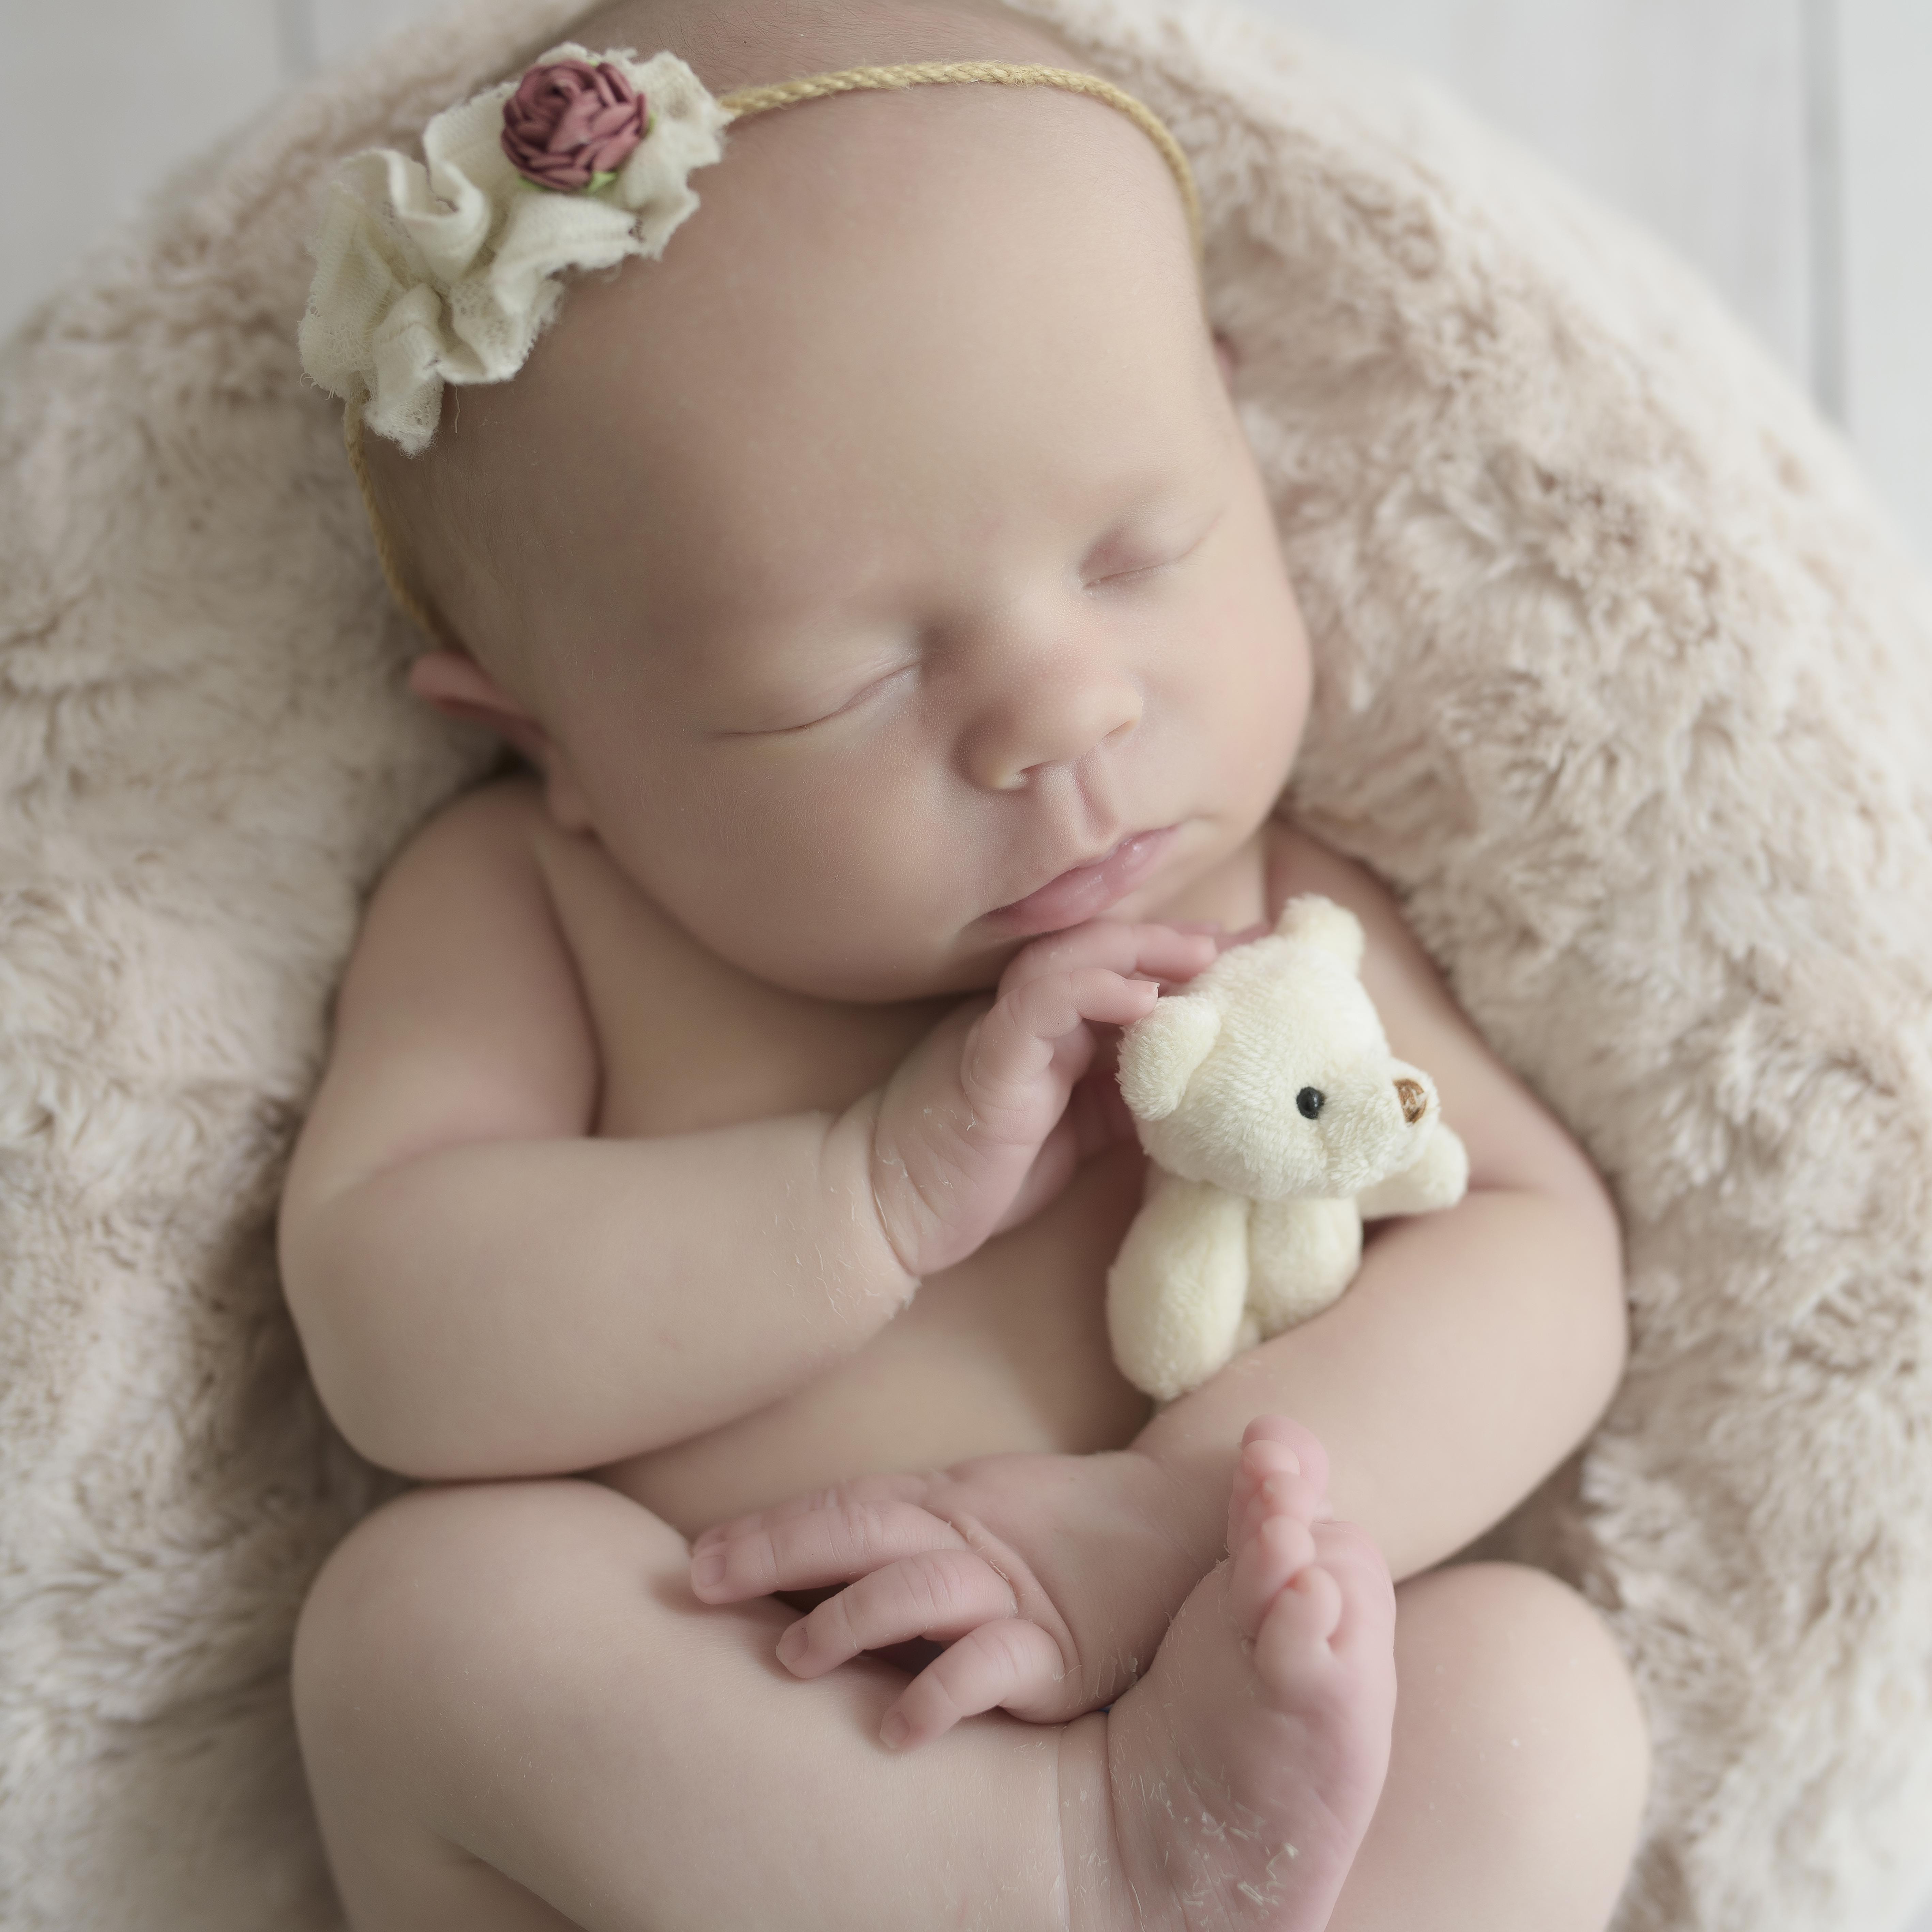 bébé Nouméa